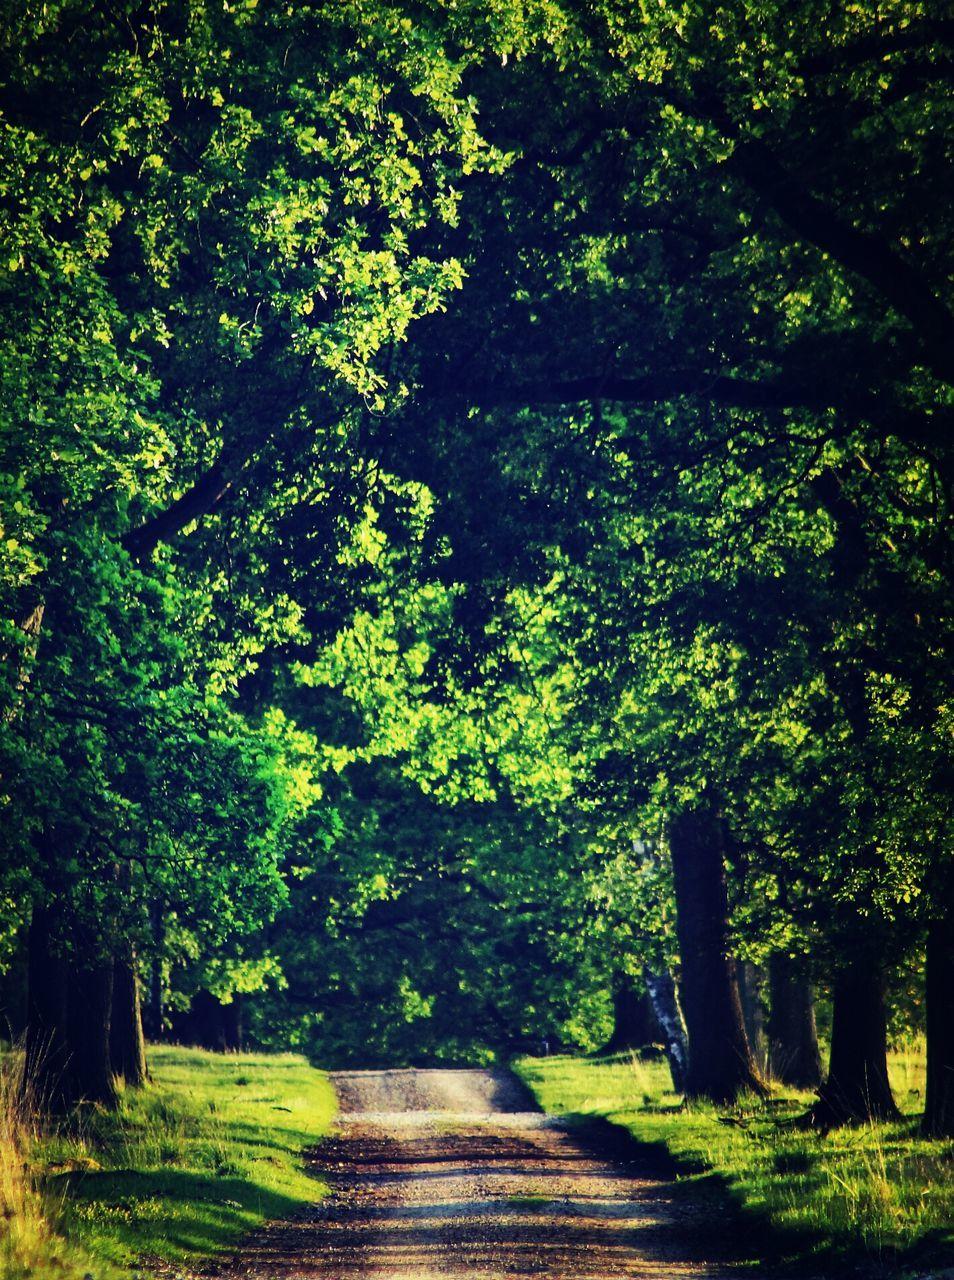 Empty Street Amidst Trees On Sunny Day